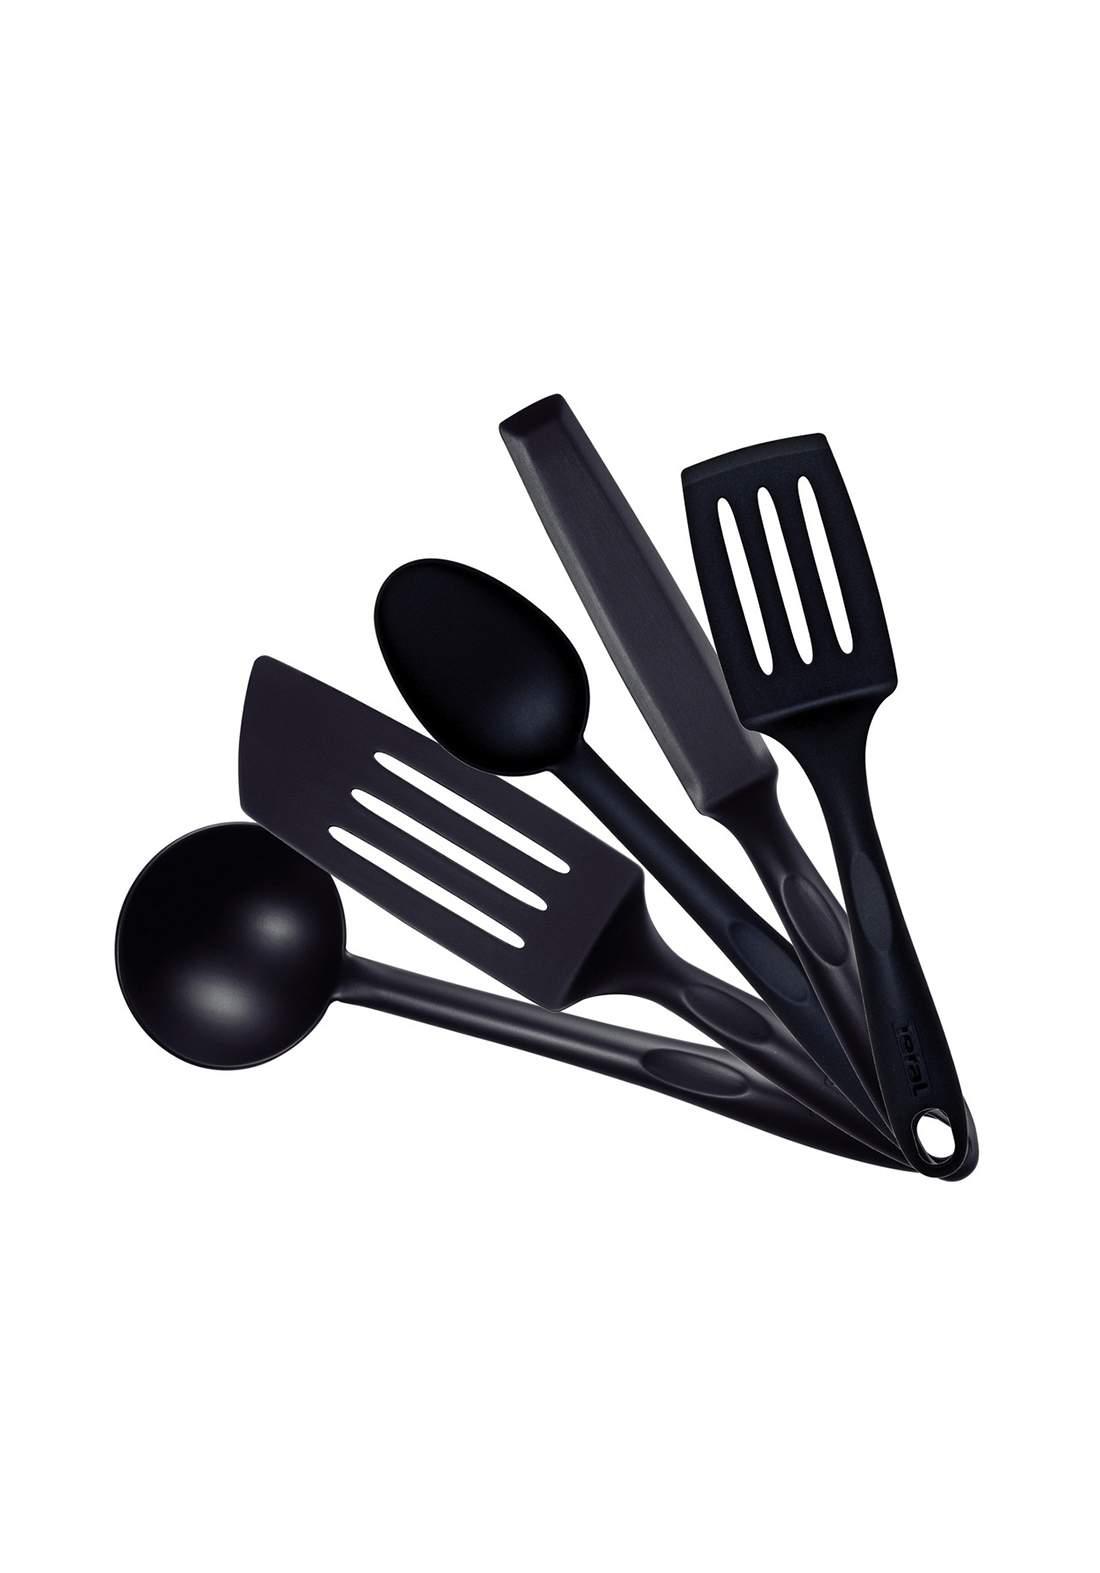 Tefal K001A505 Bienvenue Kitchen Tool 5 Pcs Set -Black سيت أدوات الطهي